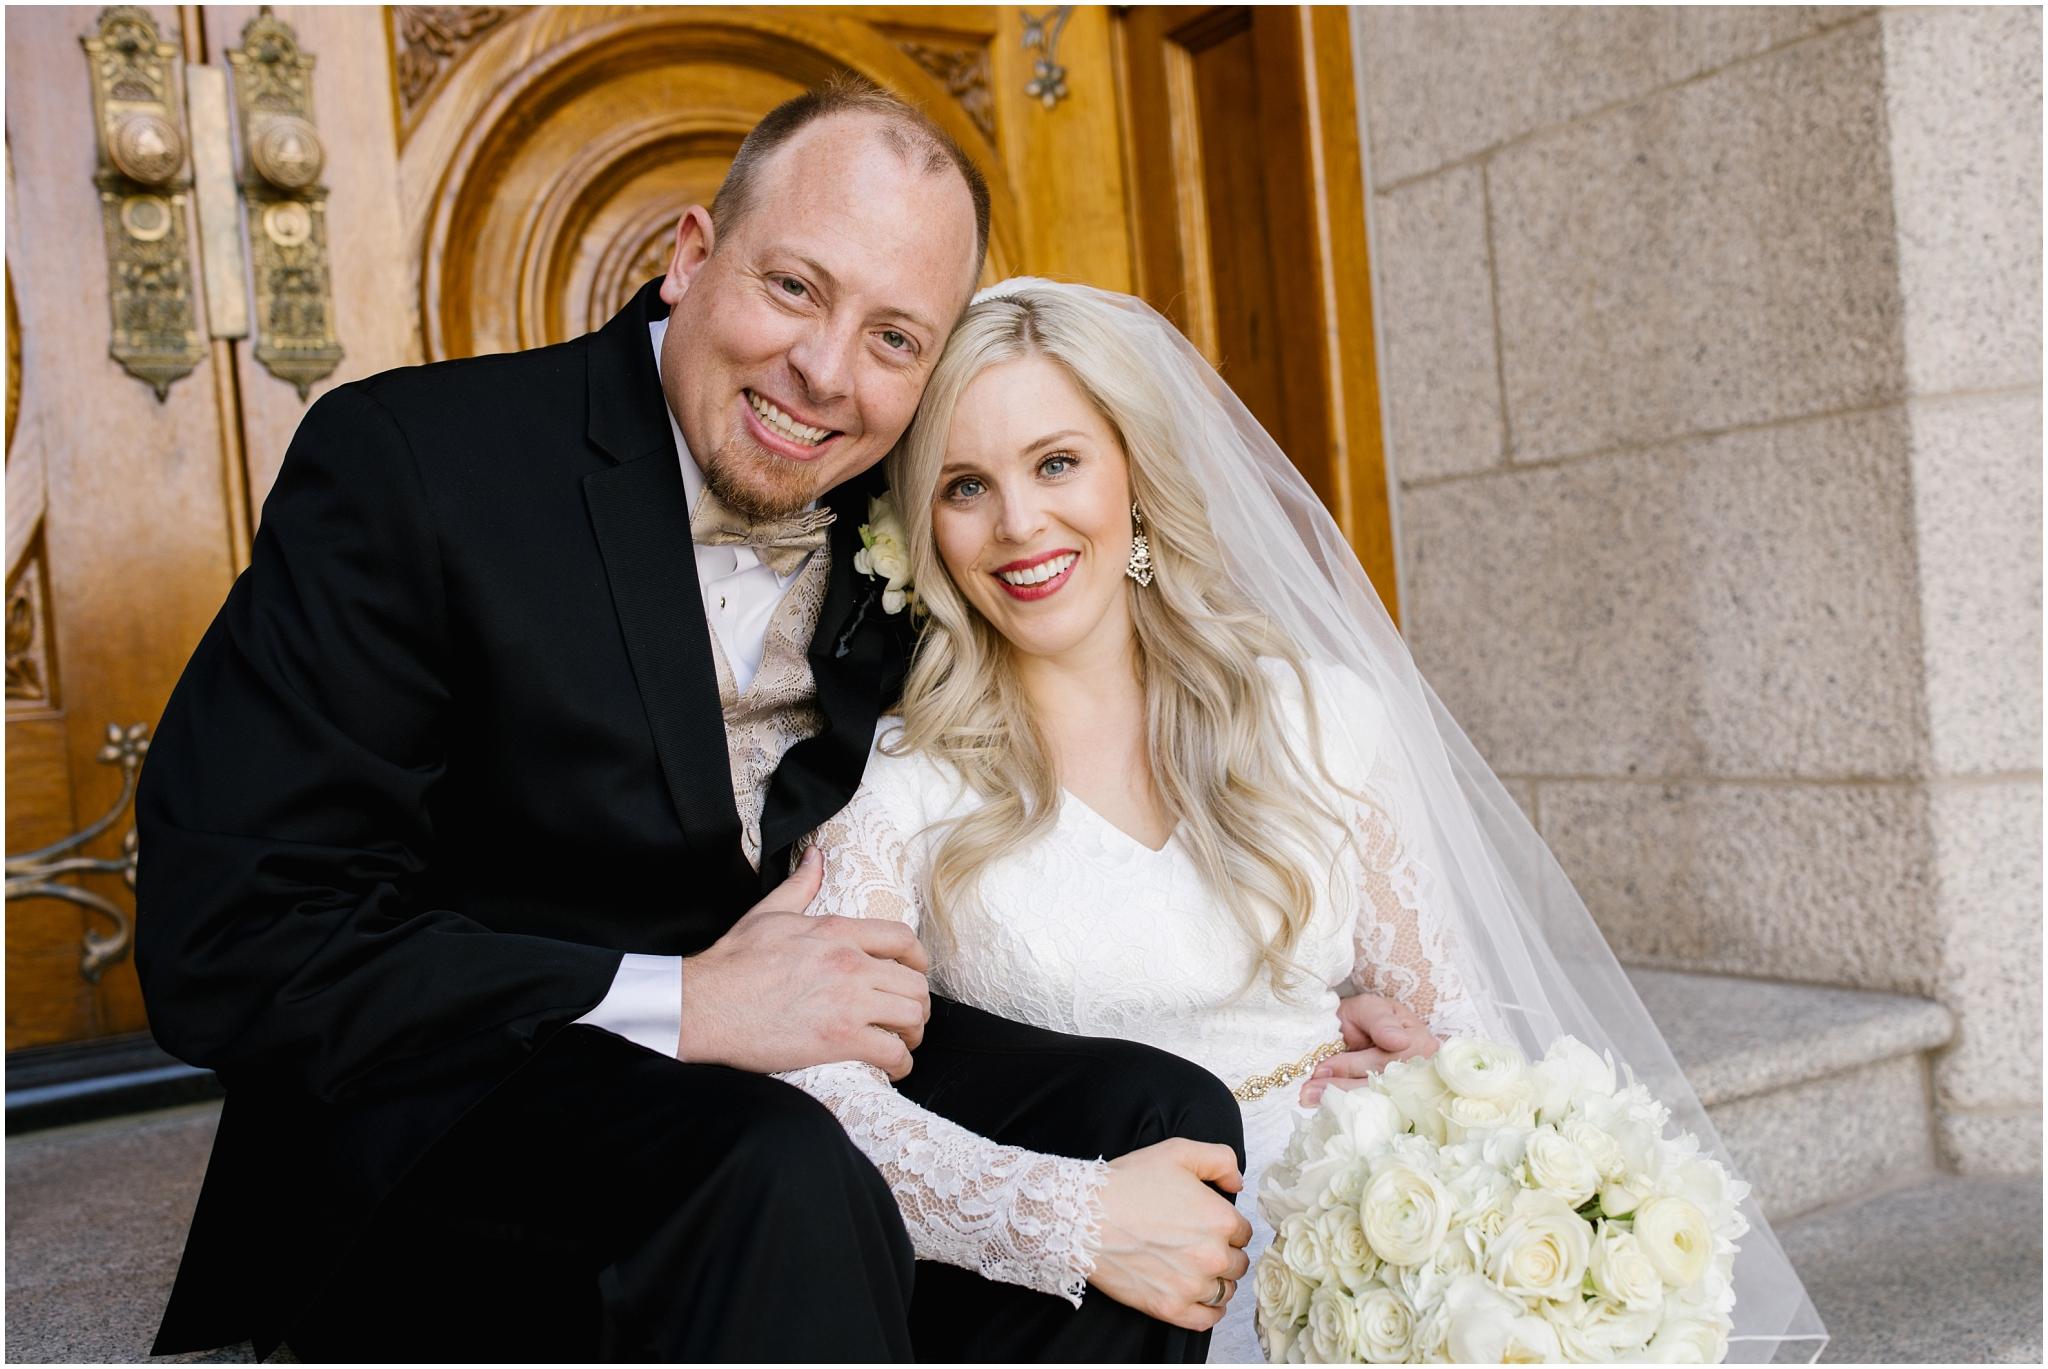 CherylandTyler-153_Lizzie-B-Imagery-Utah-Wedding-Photographer-Salt-Lake-City-Temple-Wells-Fargo-Building-Reception.jpg